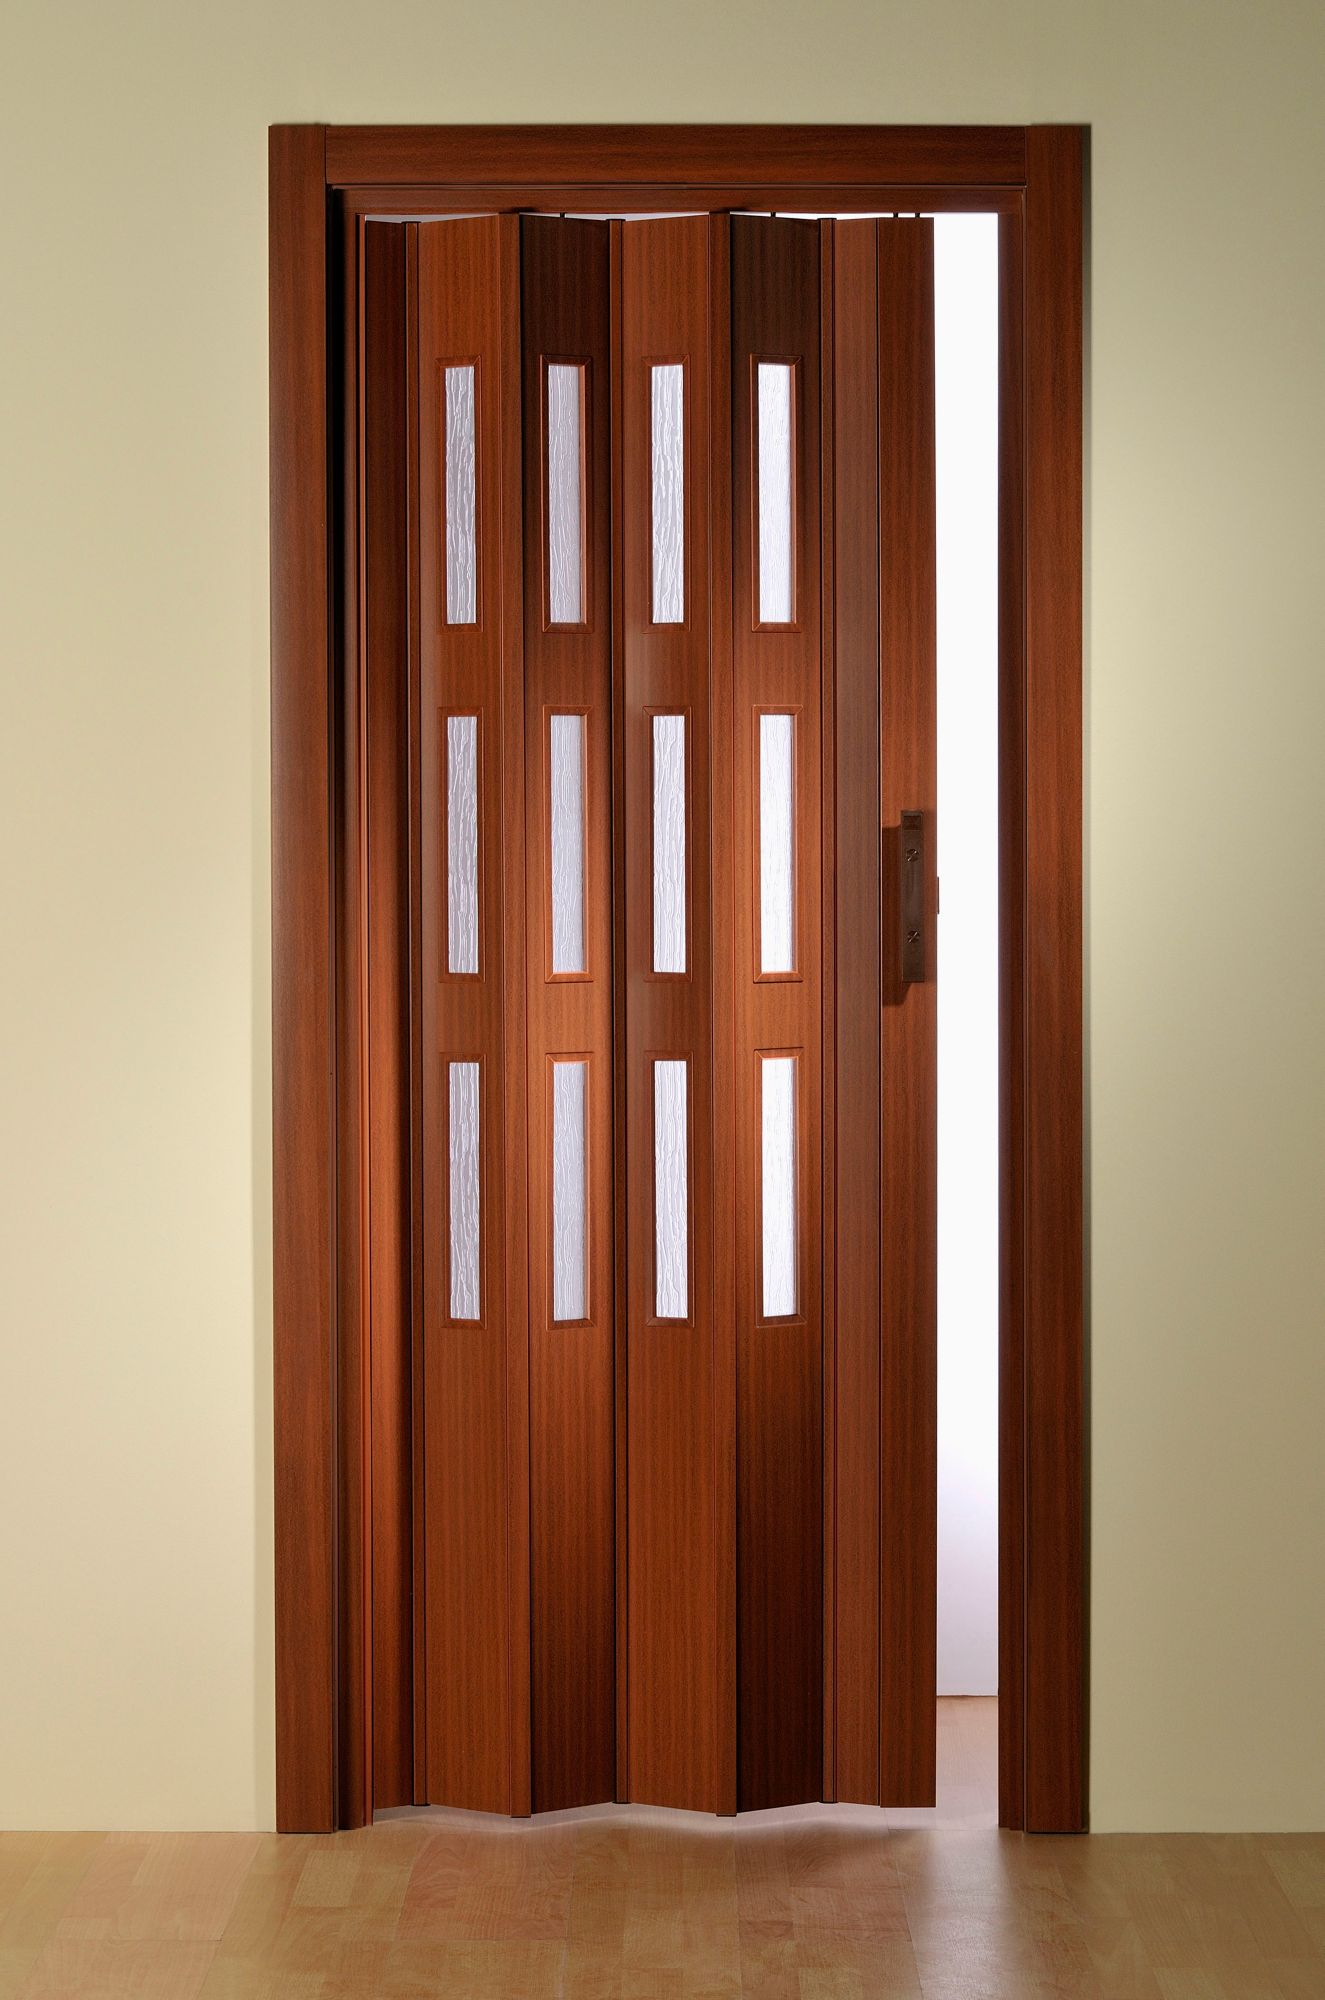 Kunststoff-Falttür , Höhe nach Maß, Mahagoni mit Fenstern in Riffelstruktur